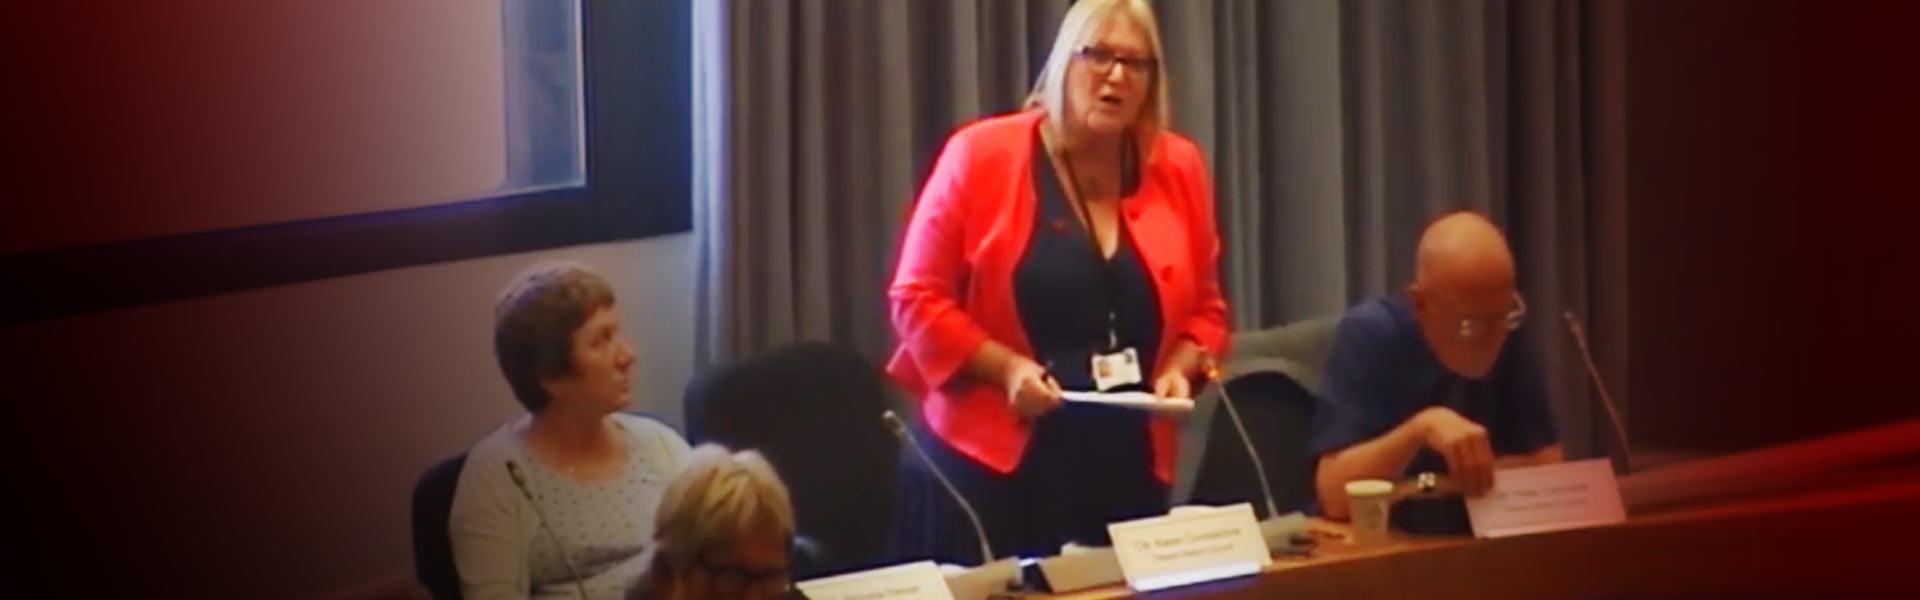 Karen Constantine asking a social housing question at Thanet District Council